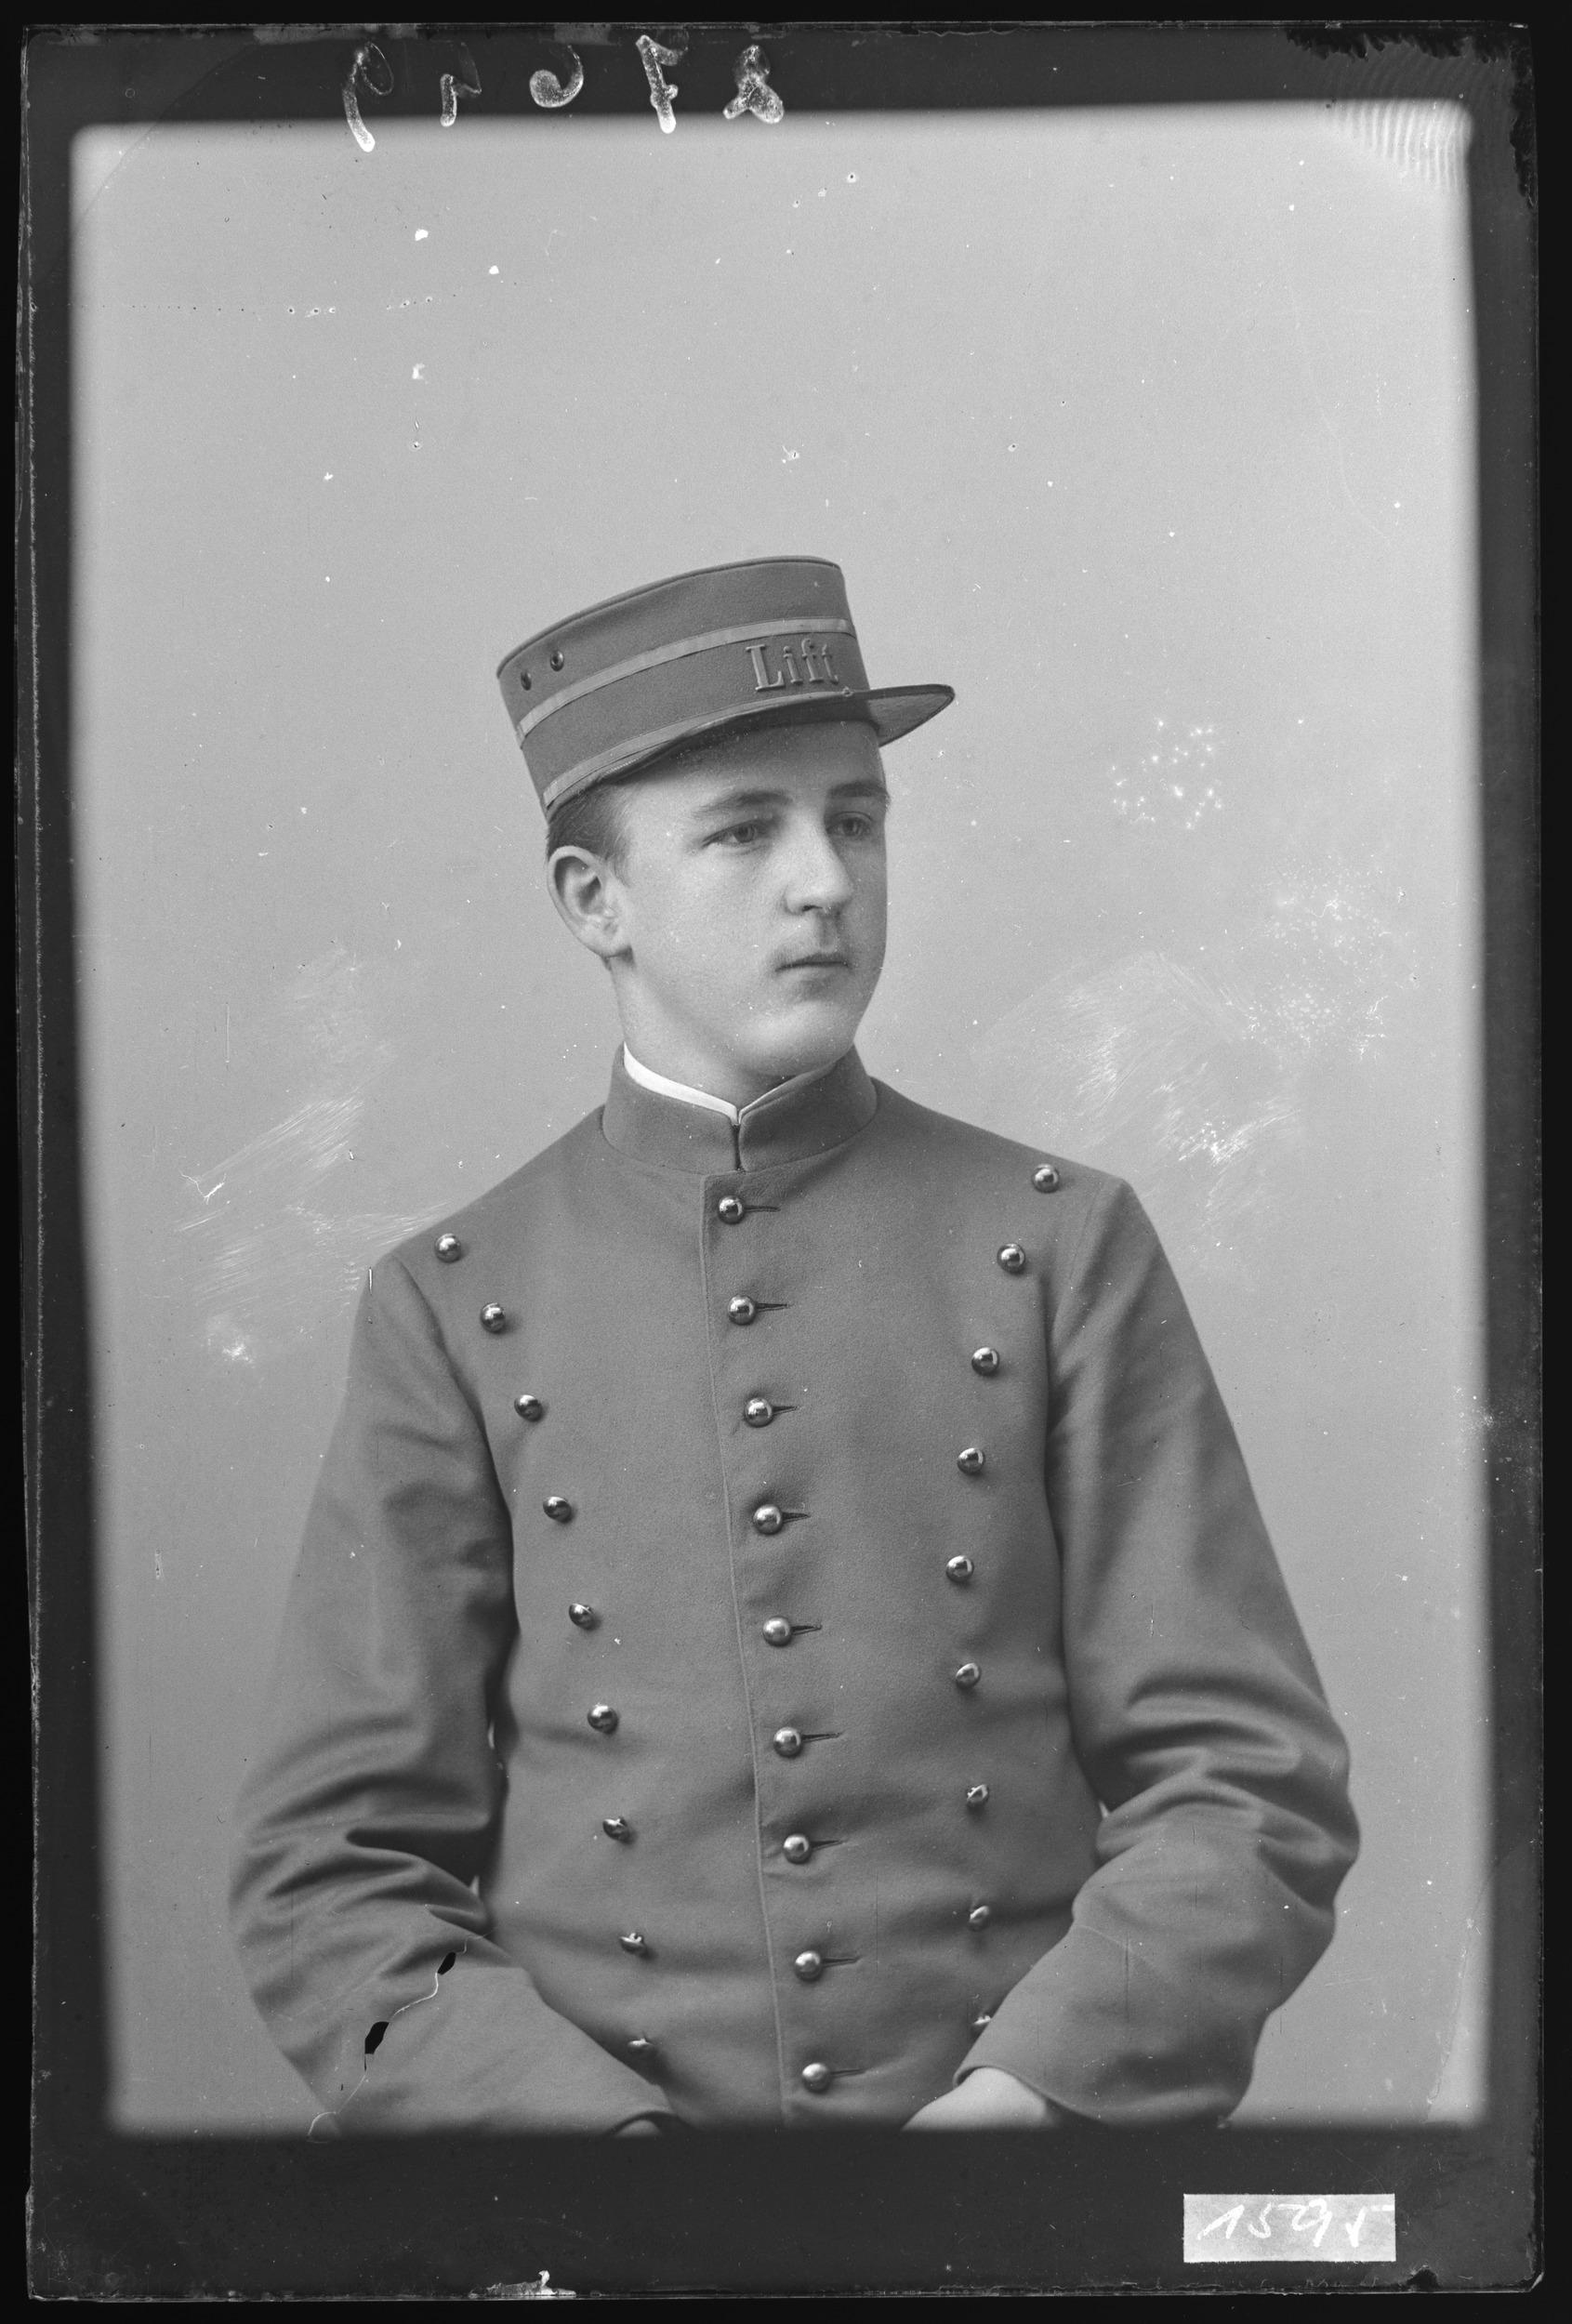 Liftboy im Grand Hotel Baden; Foto um 1900; Stadtarchiv Baden, Fotohaus Zipser, Q.12.1.1595, CC BY-SA 4.0.